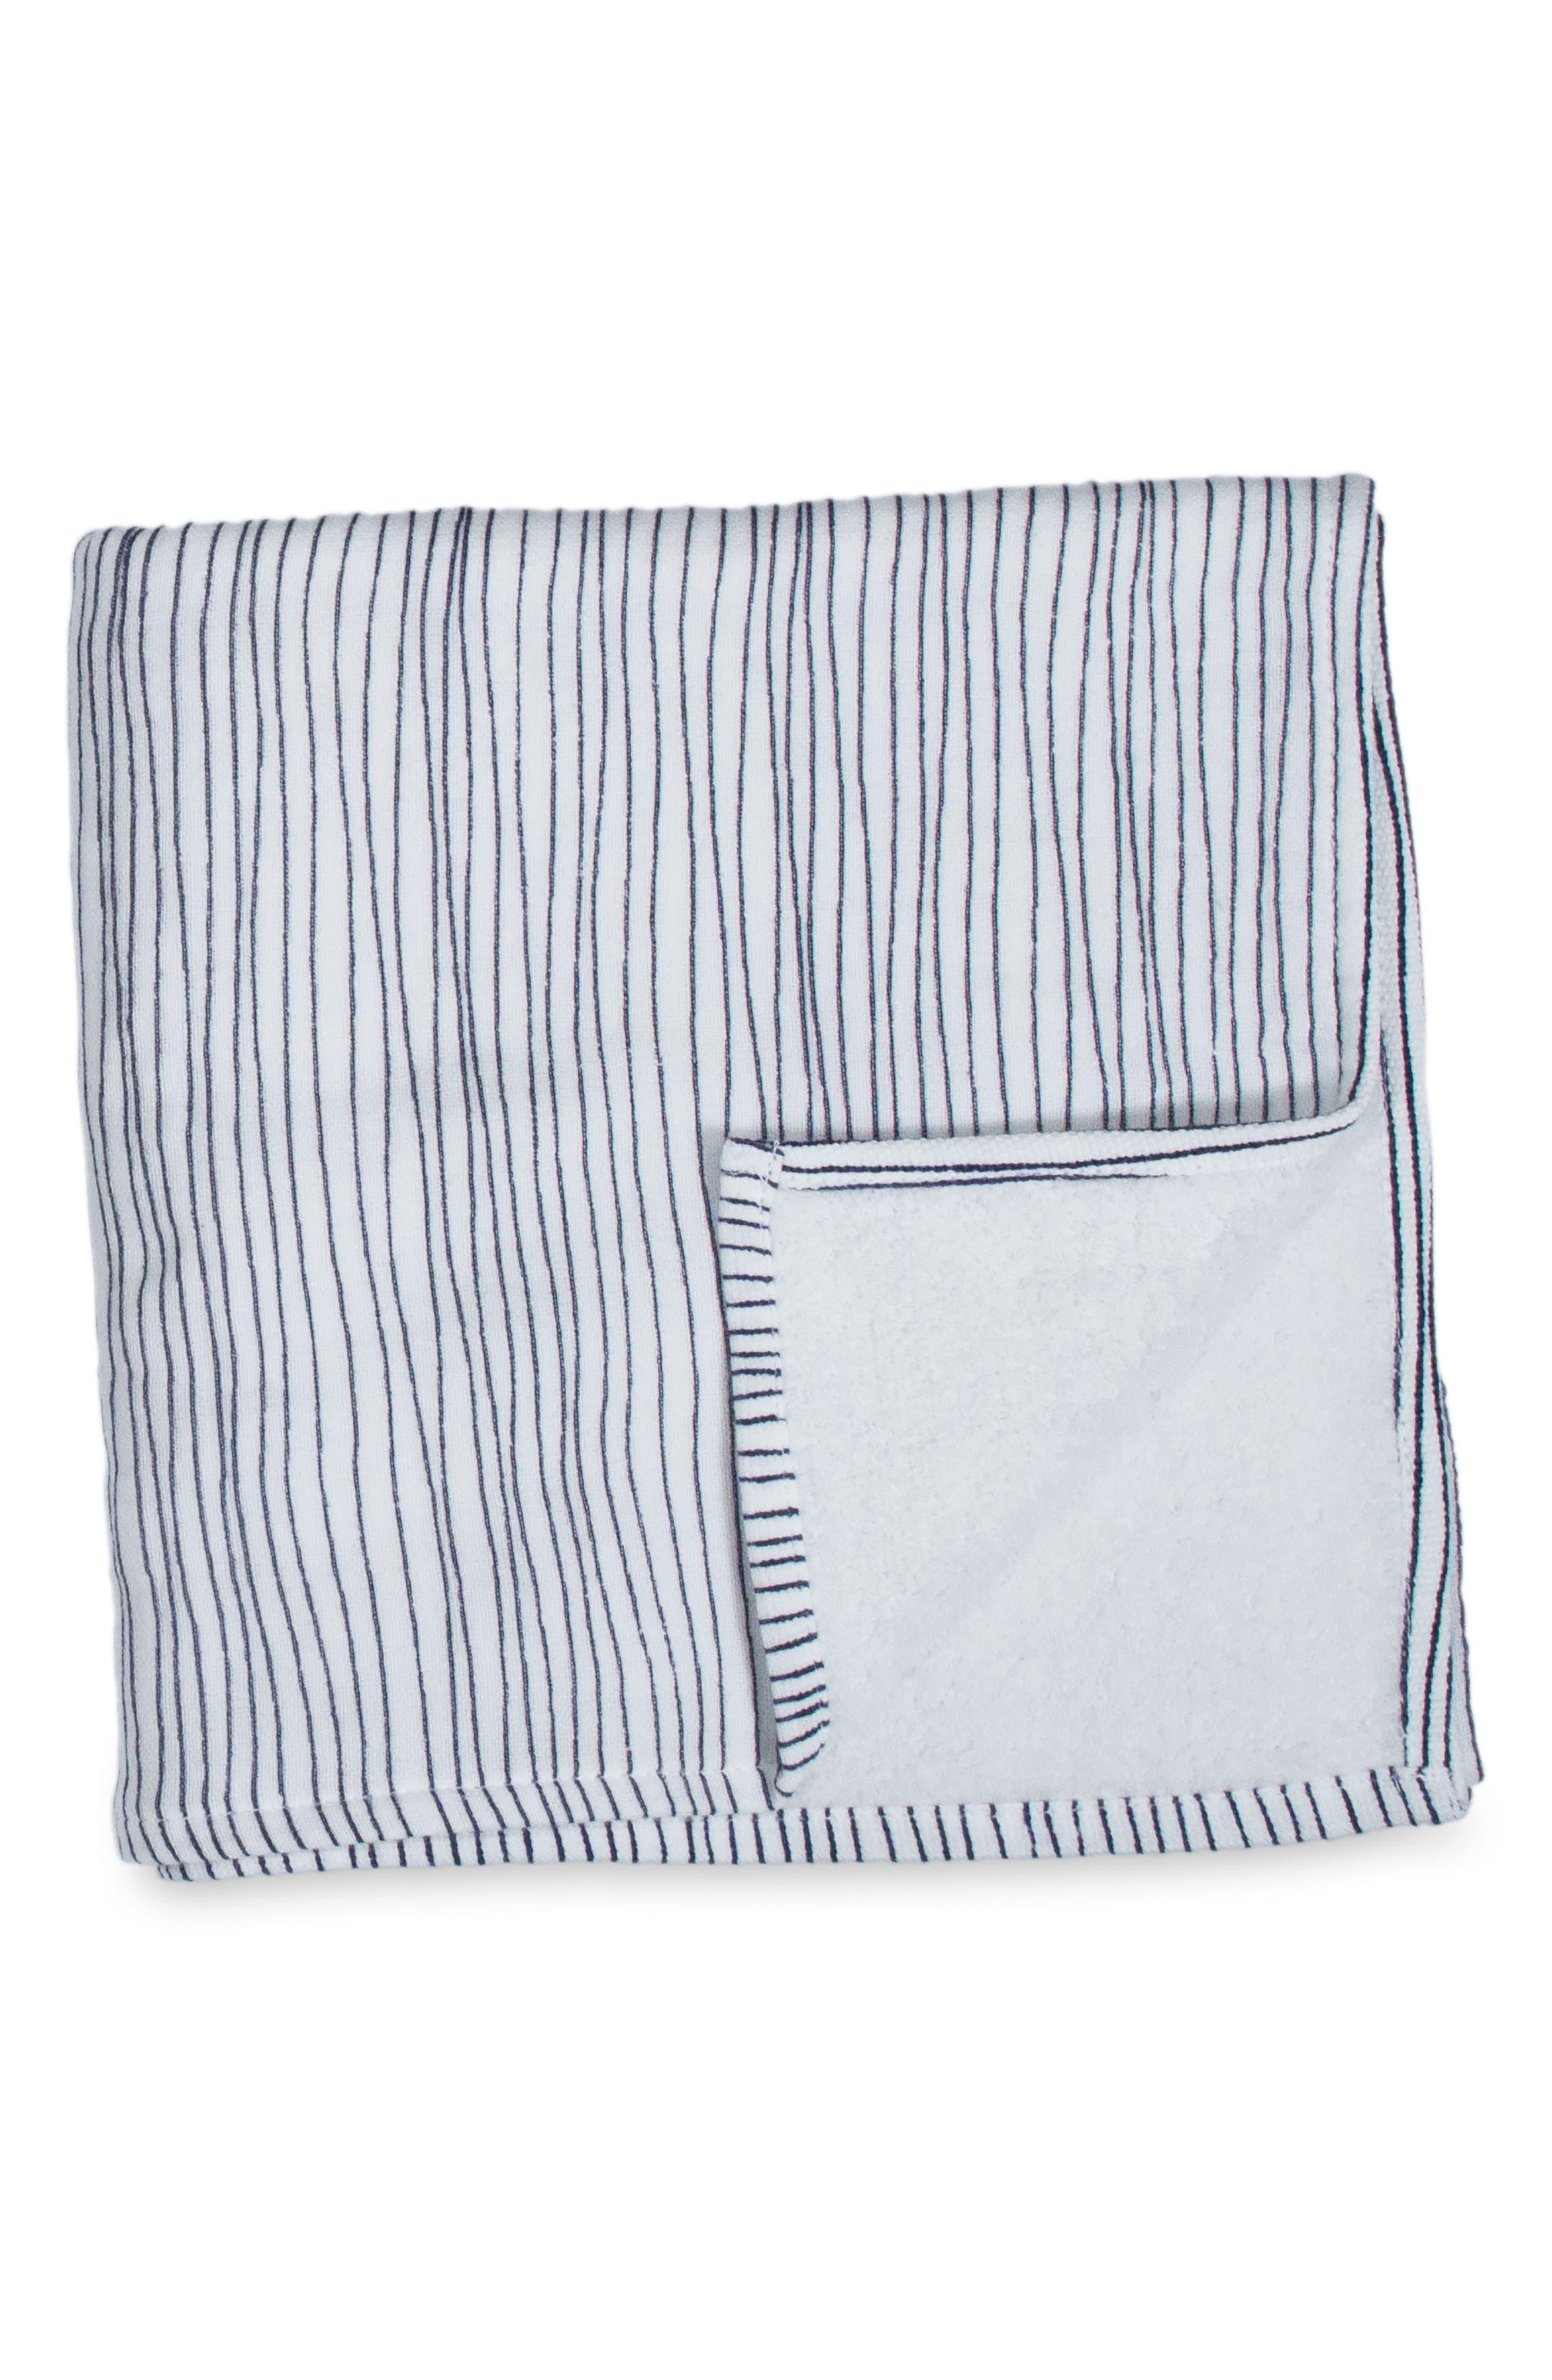 Main Image - Uchino Zero Twist Stripe Bath Towel